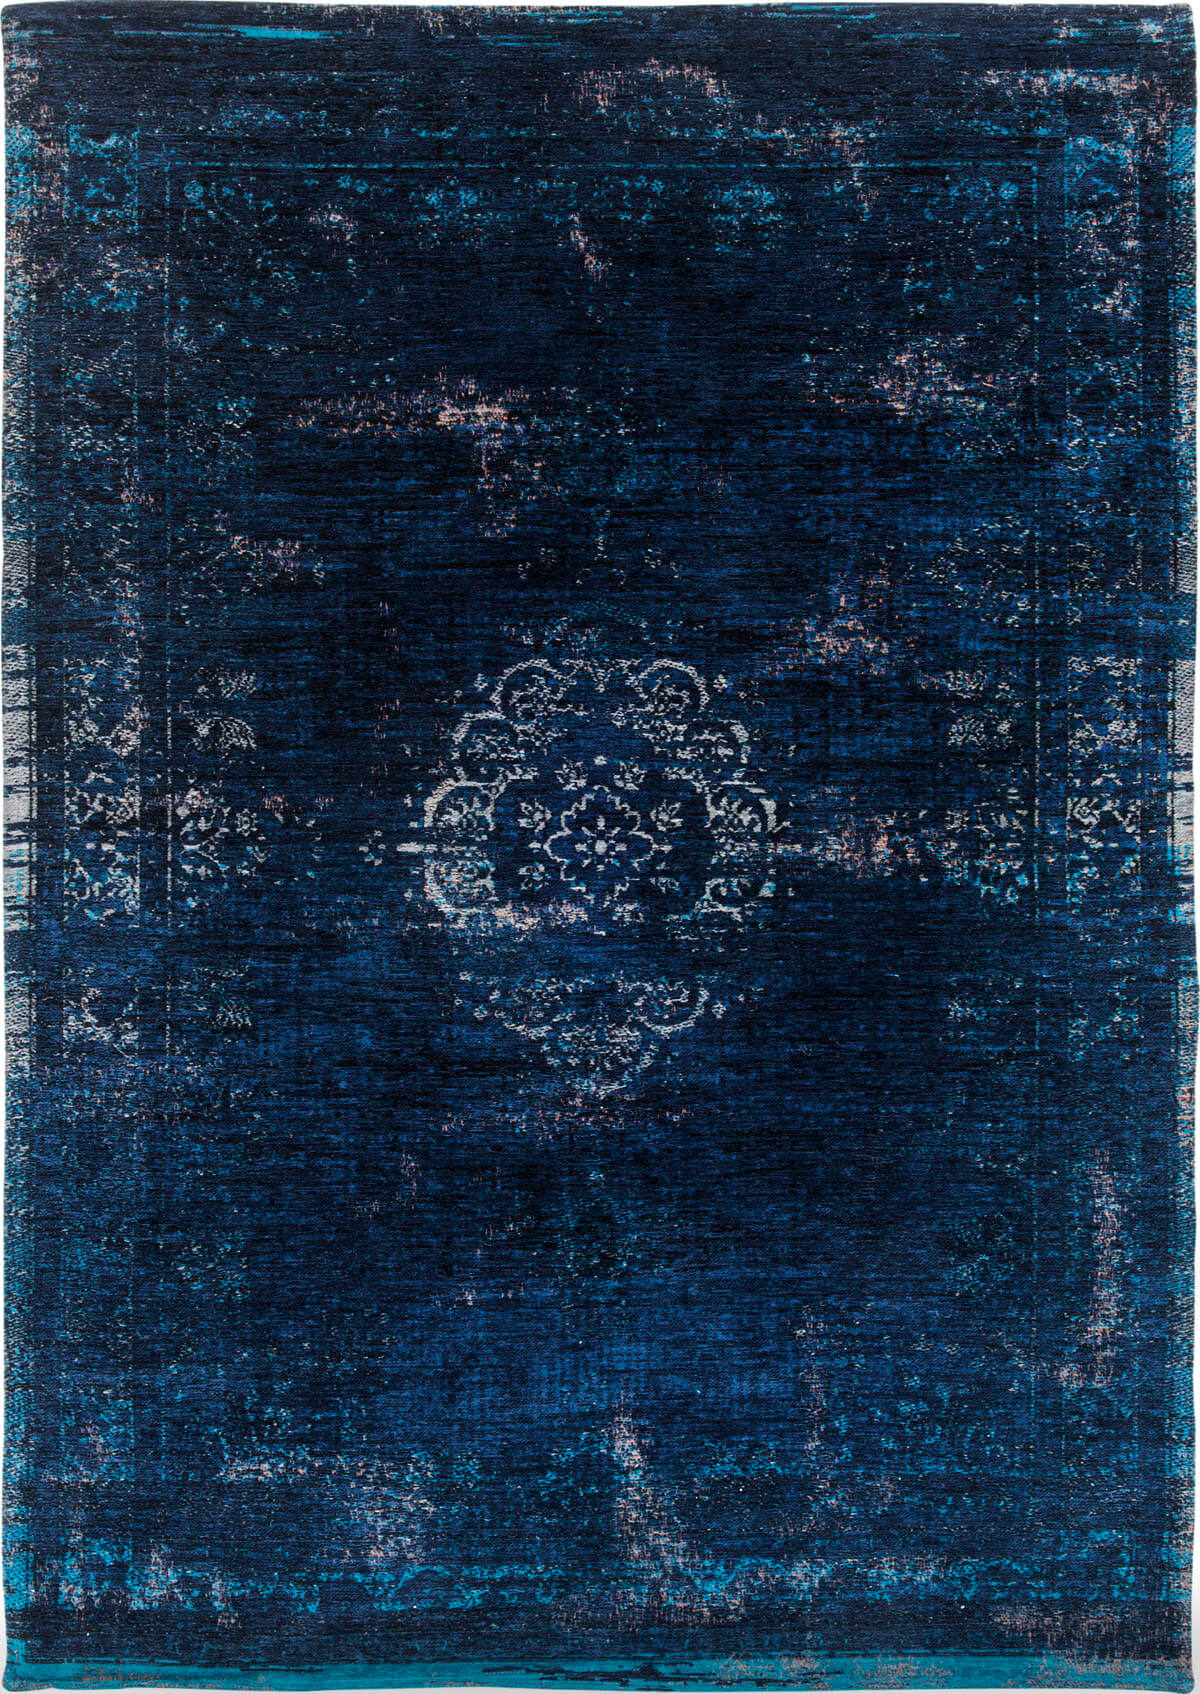 Dywan naturalny Orient granatowy - Blue Night 8254